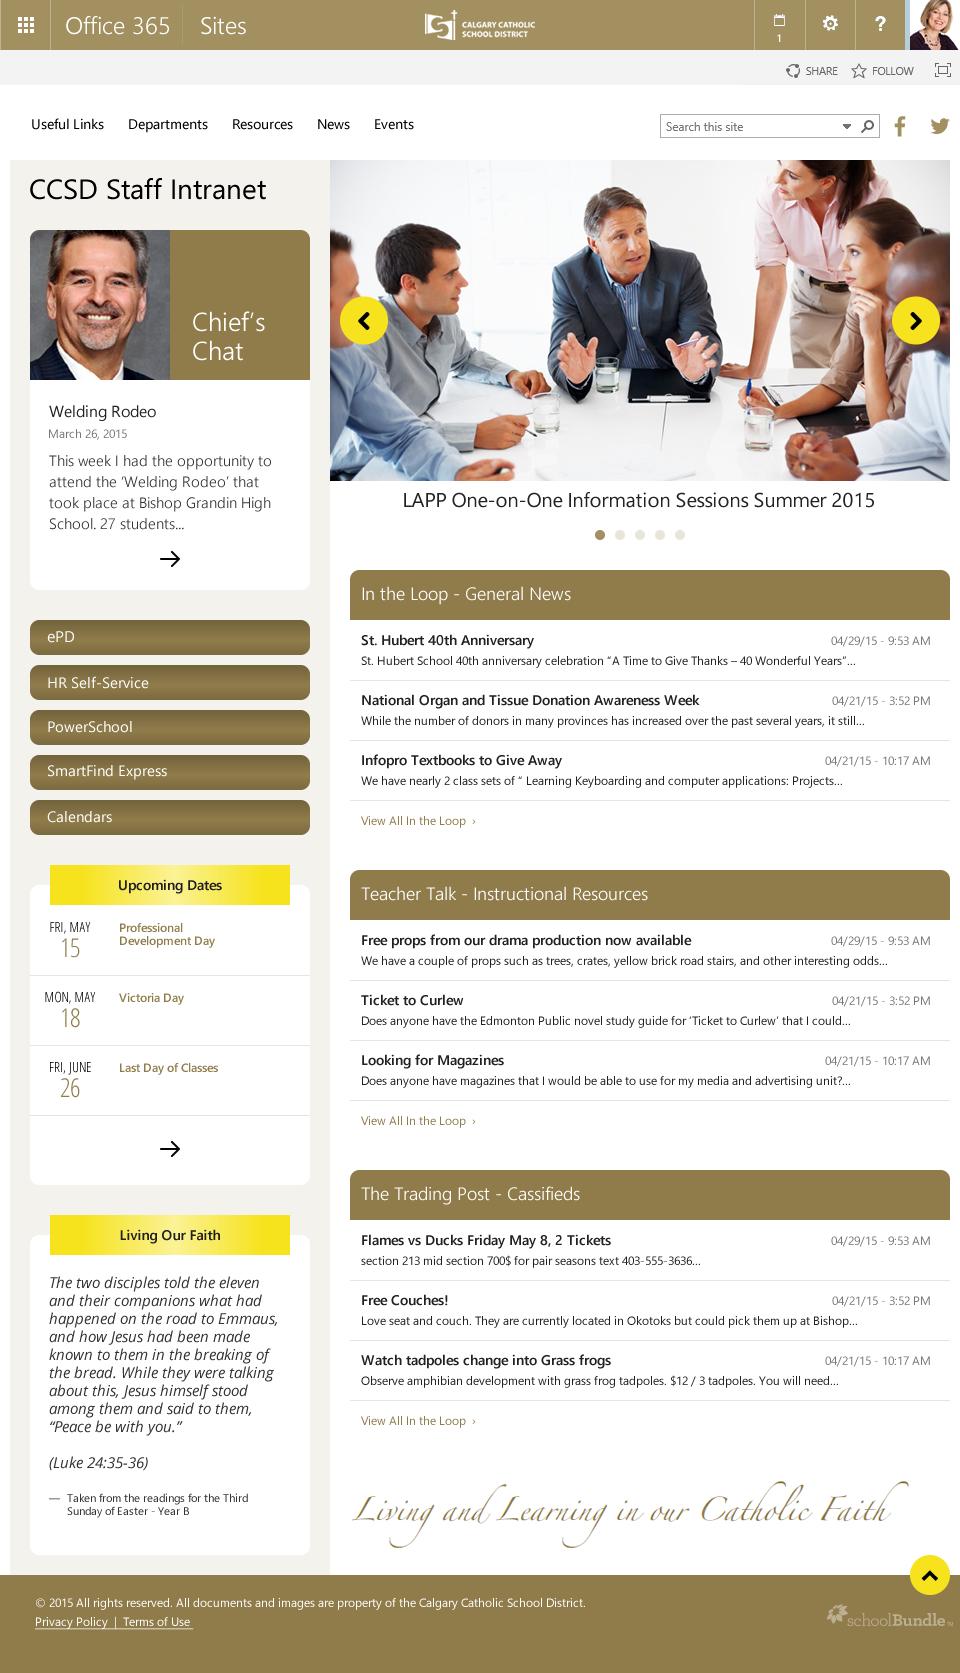 CCSD Employee Intranet (Portal)